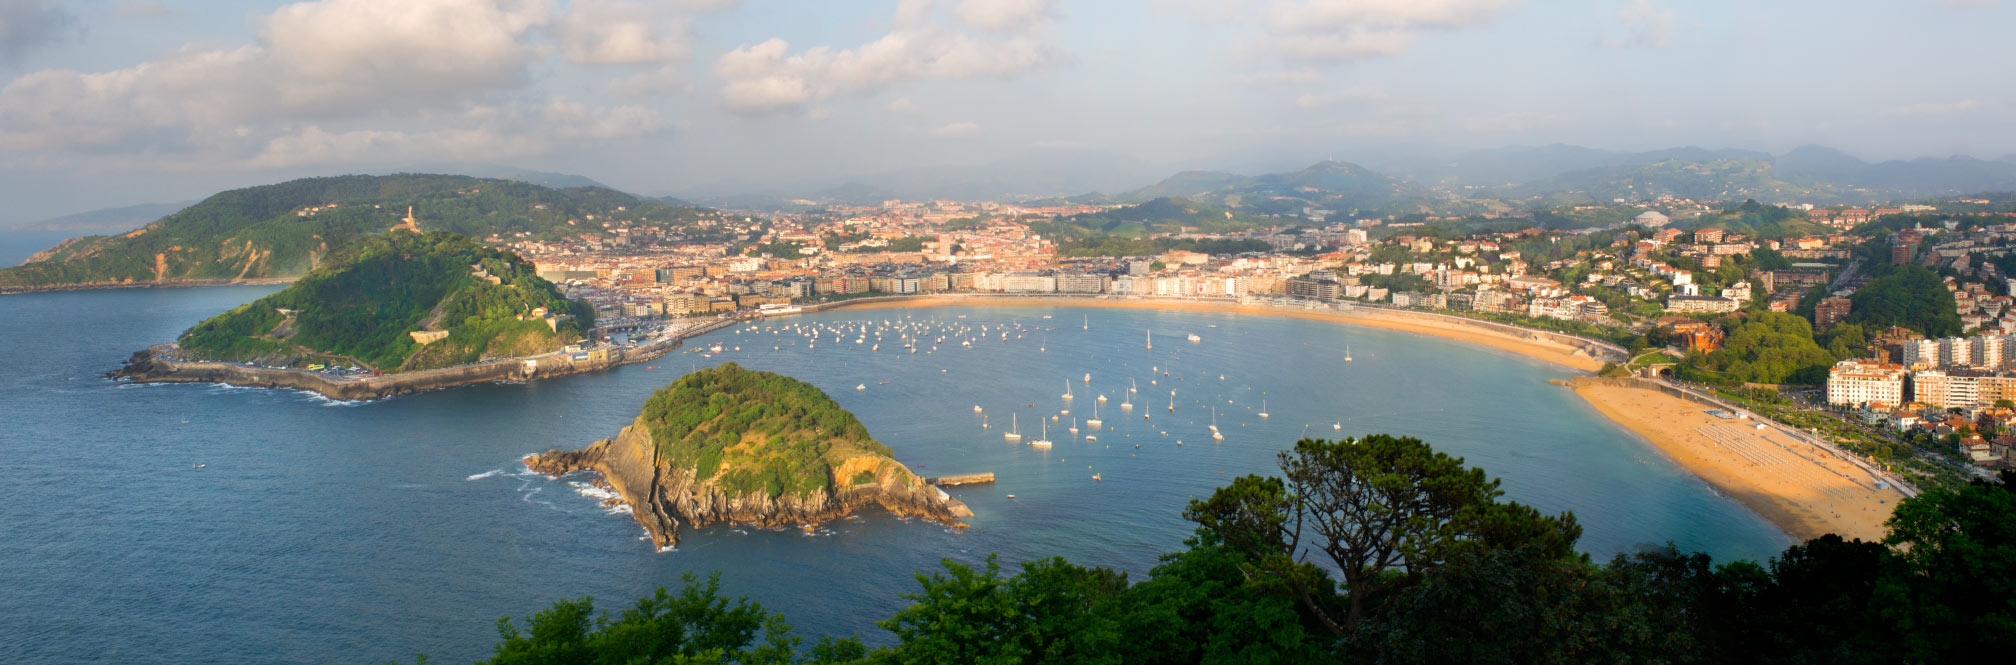 San sebastian spanien baskenland reisef hrer for Para desarrollar un parque ajardinado